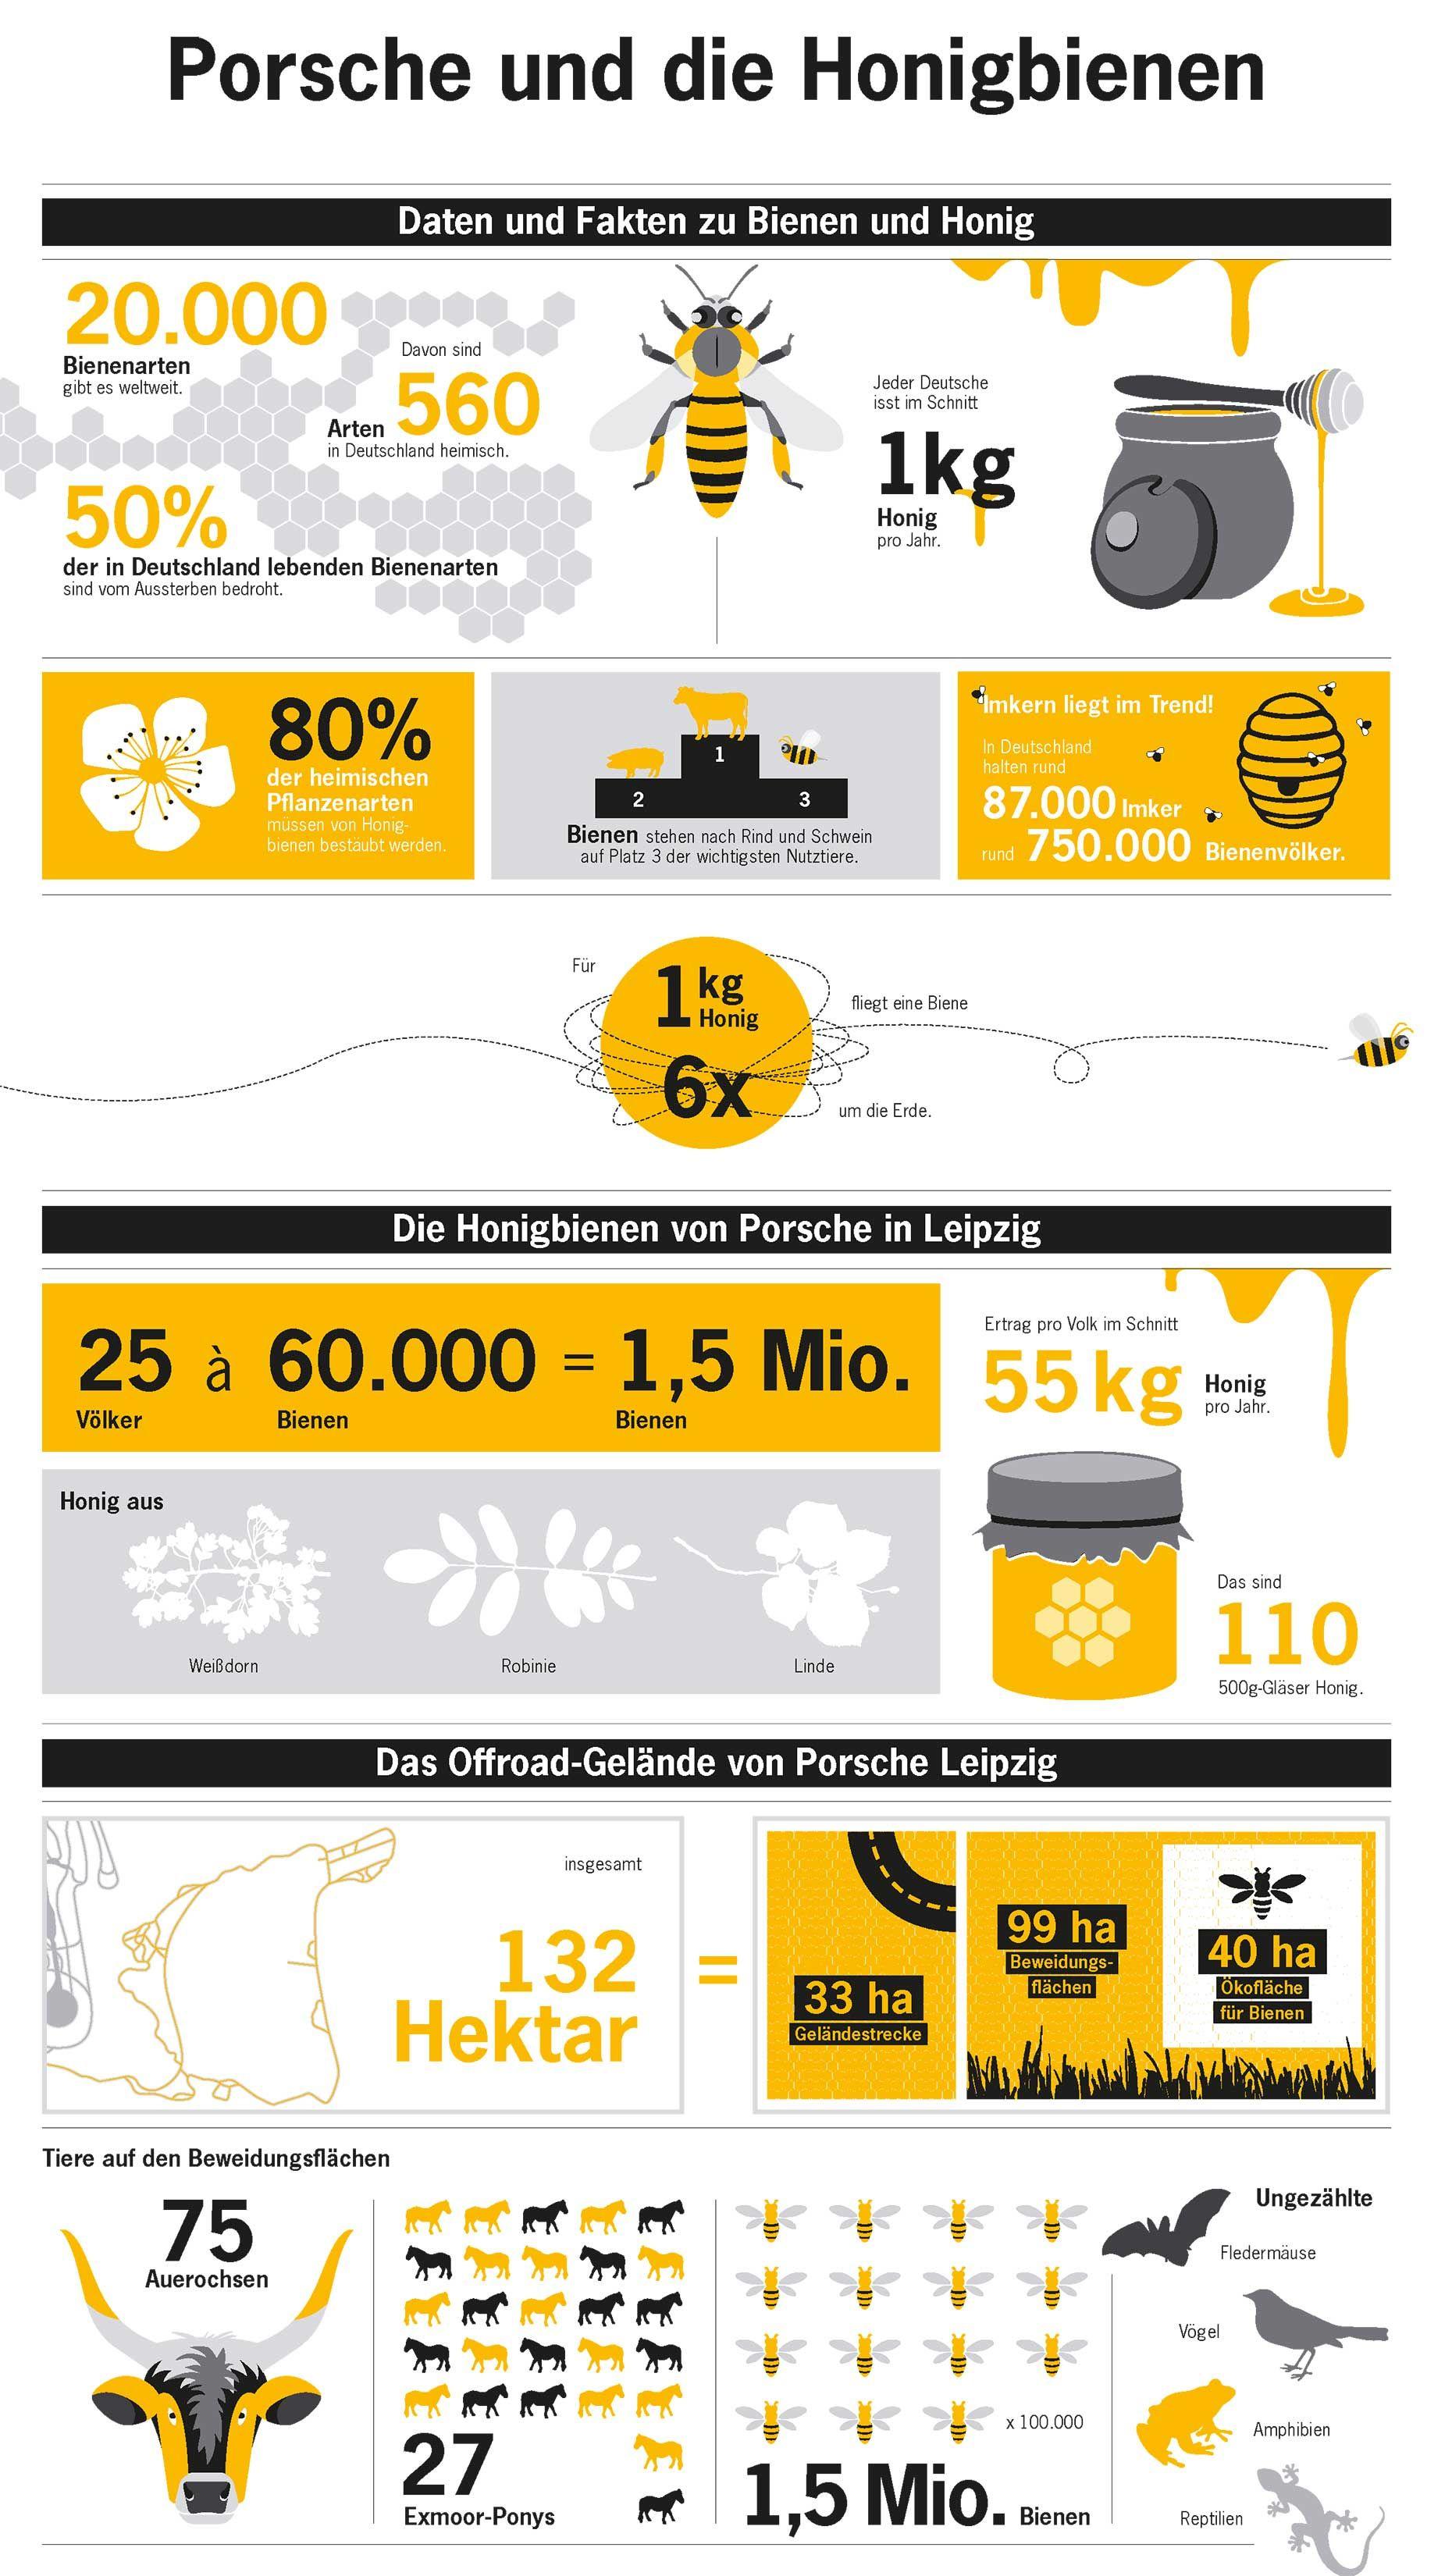 Porsche Siedelt In Leipzig 1 5 Millionen Honigbienen An Bienen Honigbiene Honig